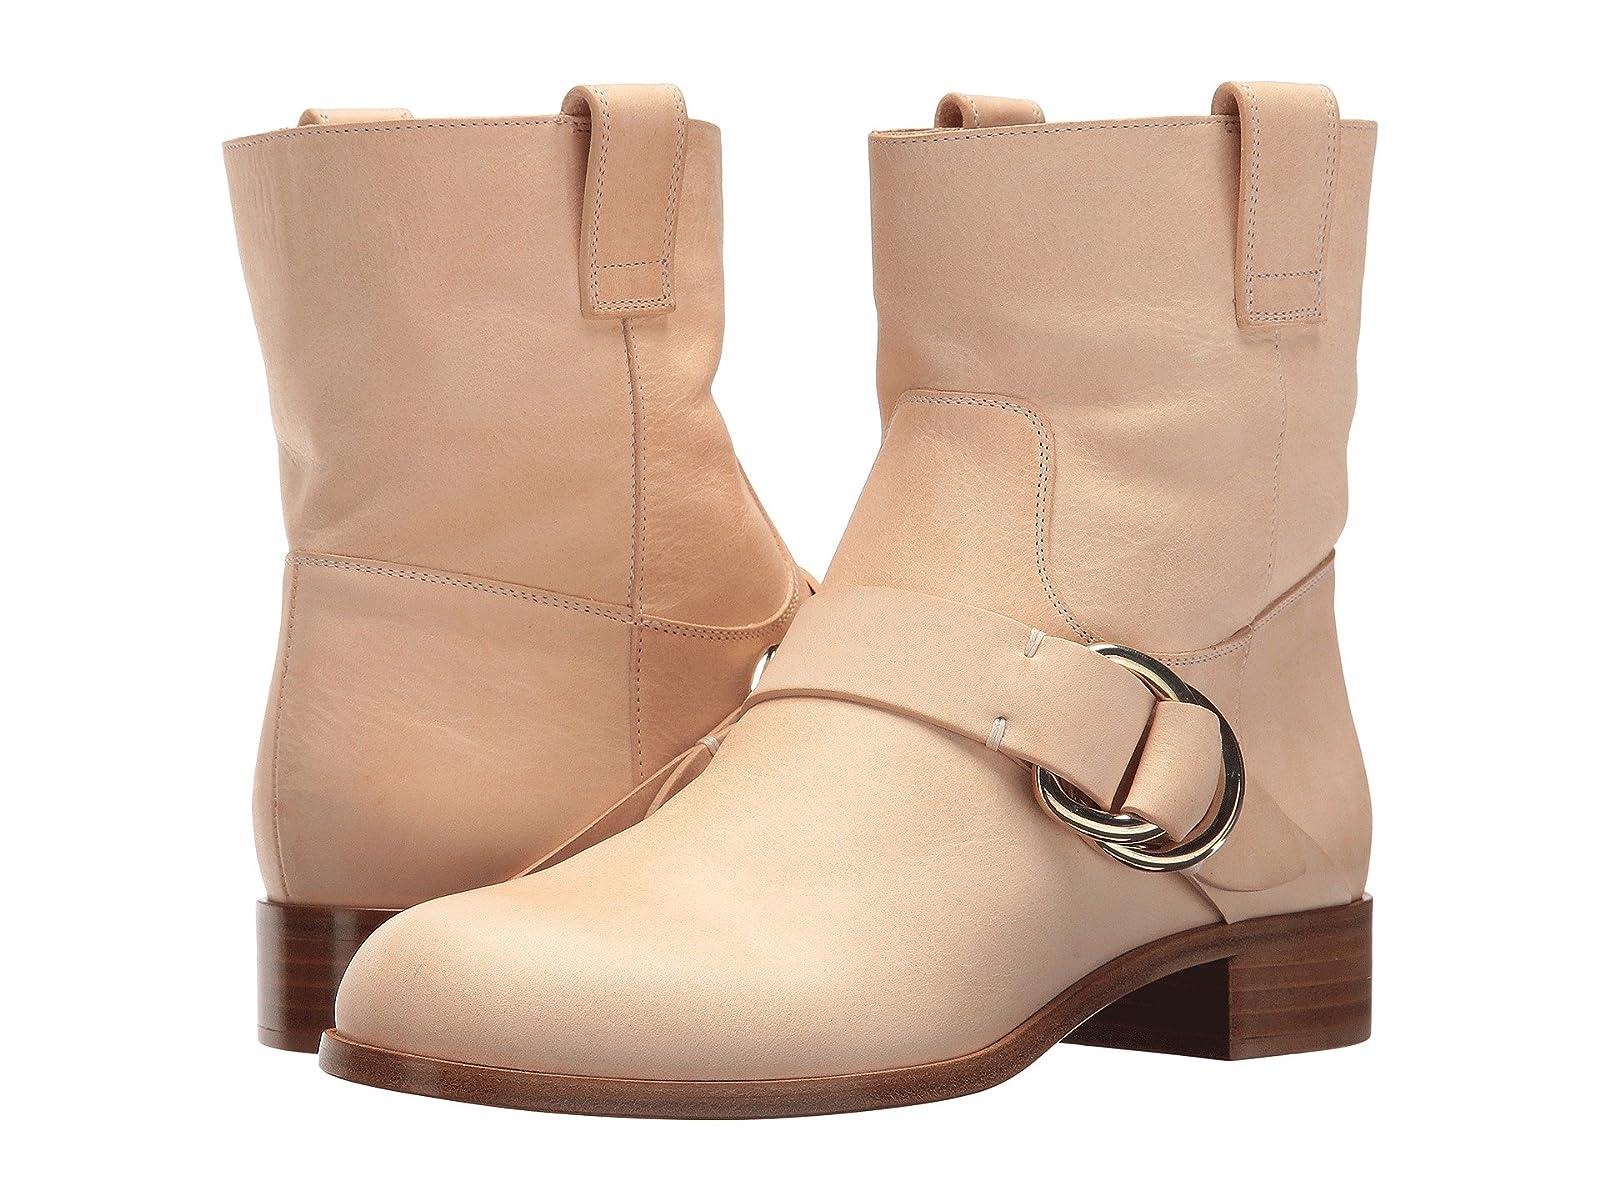 Frye Ricki Ring StrapCheap and distinctive eye-catching shoes